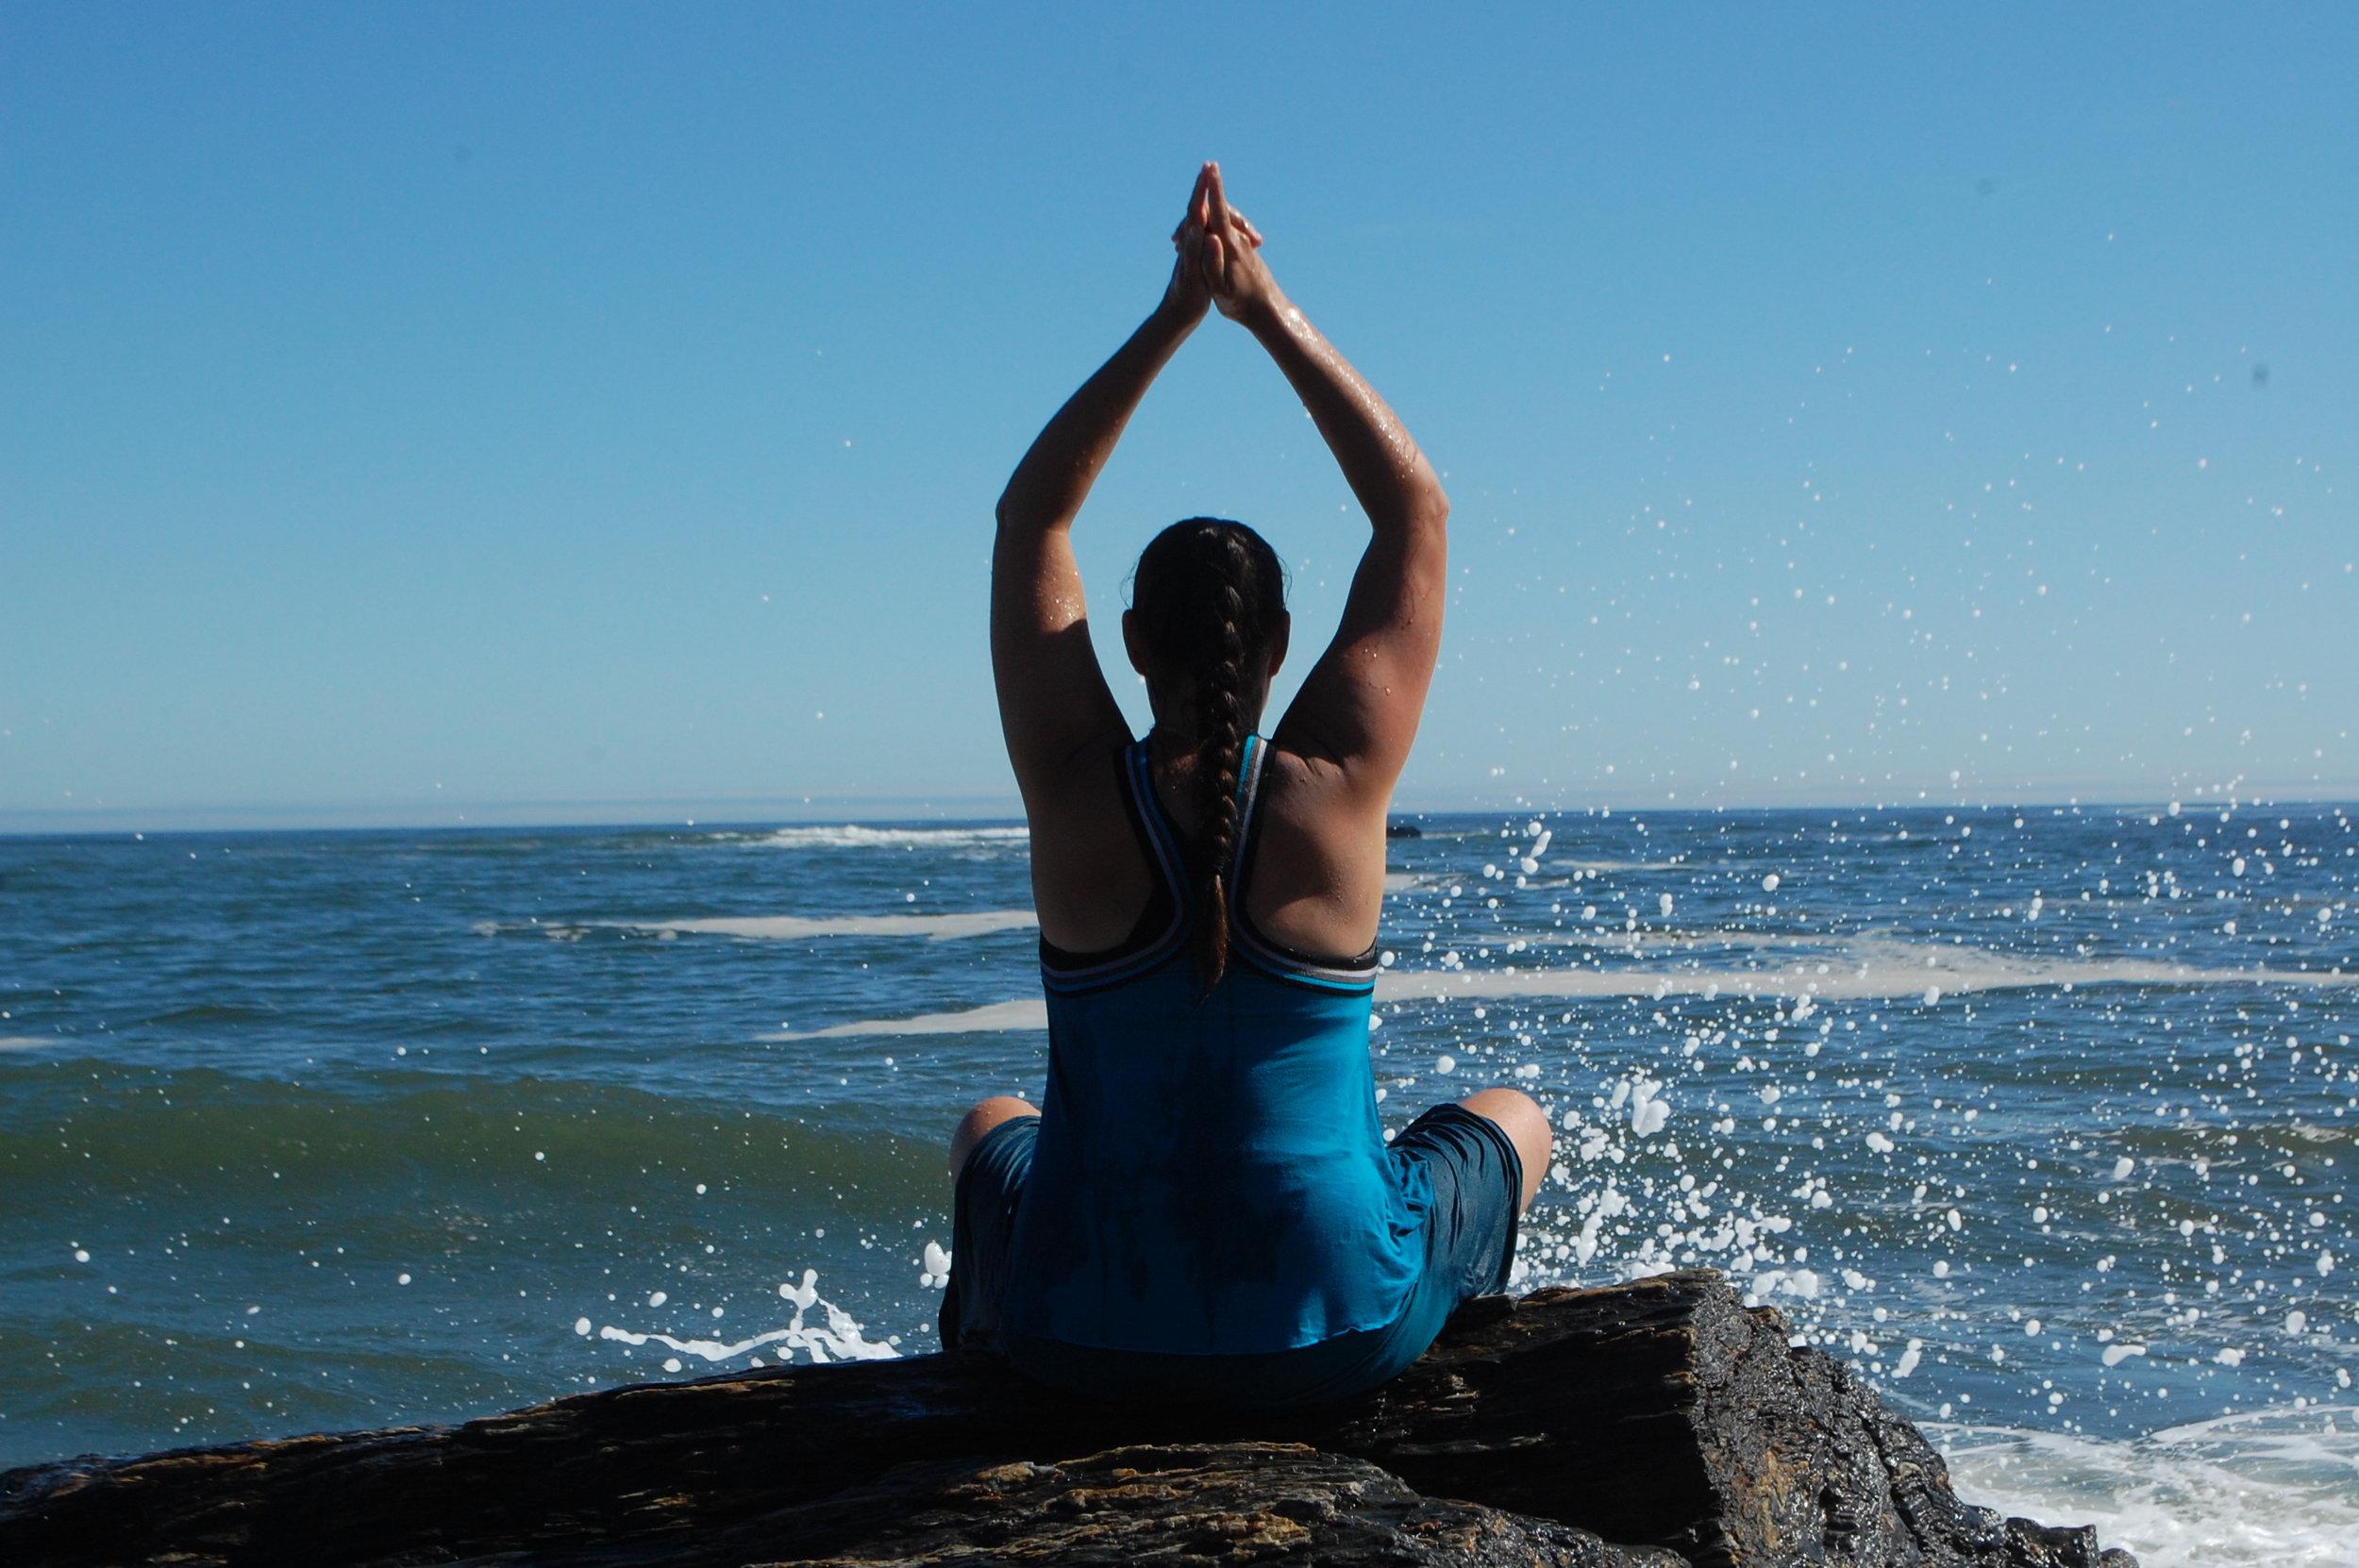 Find Your Inner Flow based on Your Inner Star